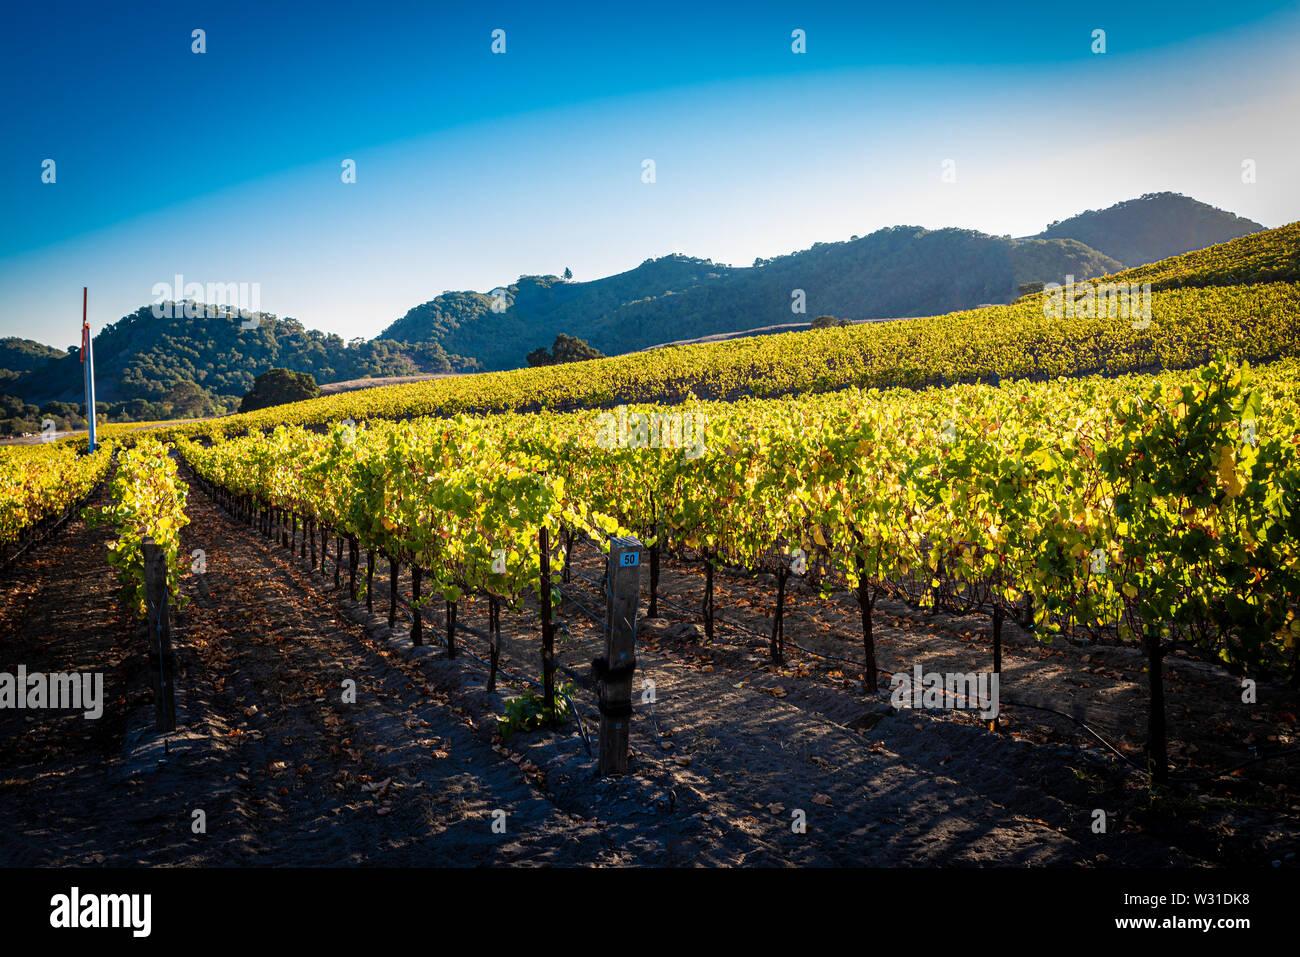 A vineyard in central California Stock Photo